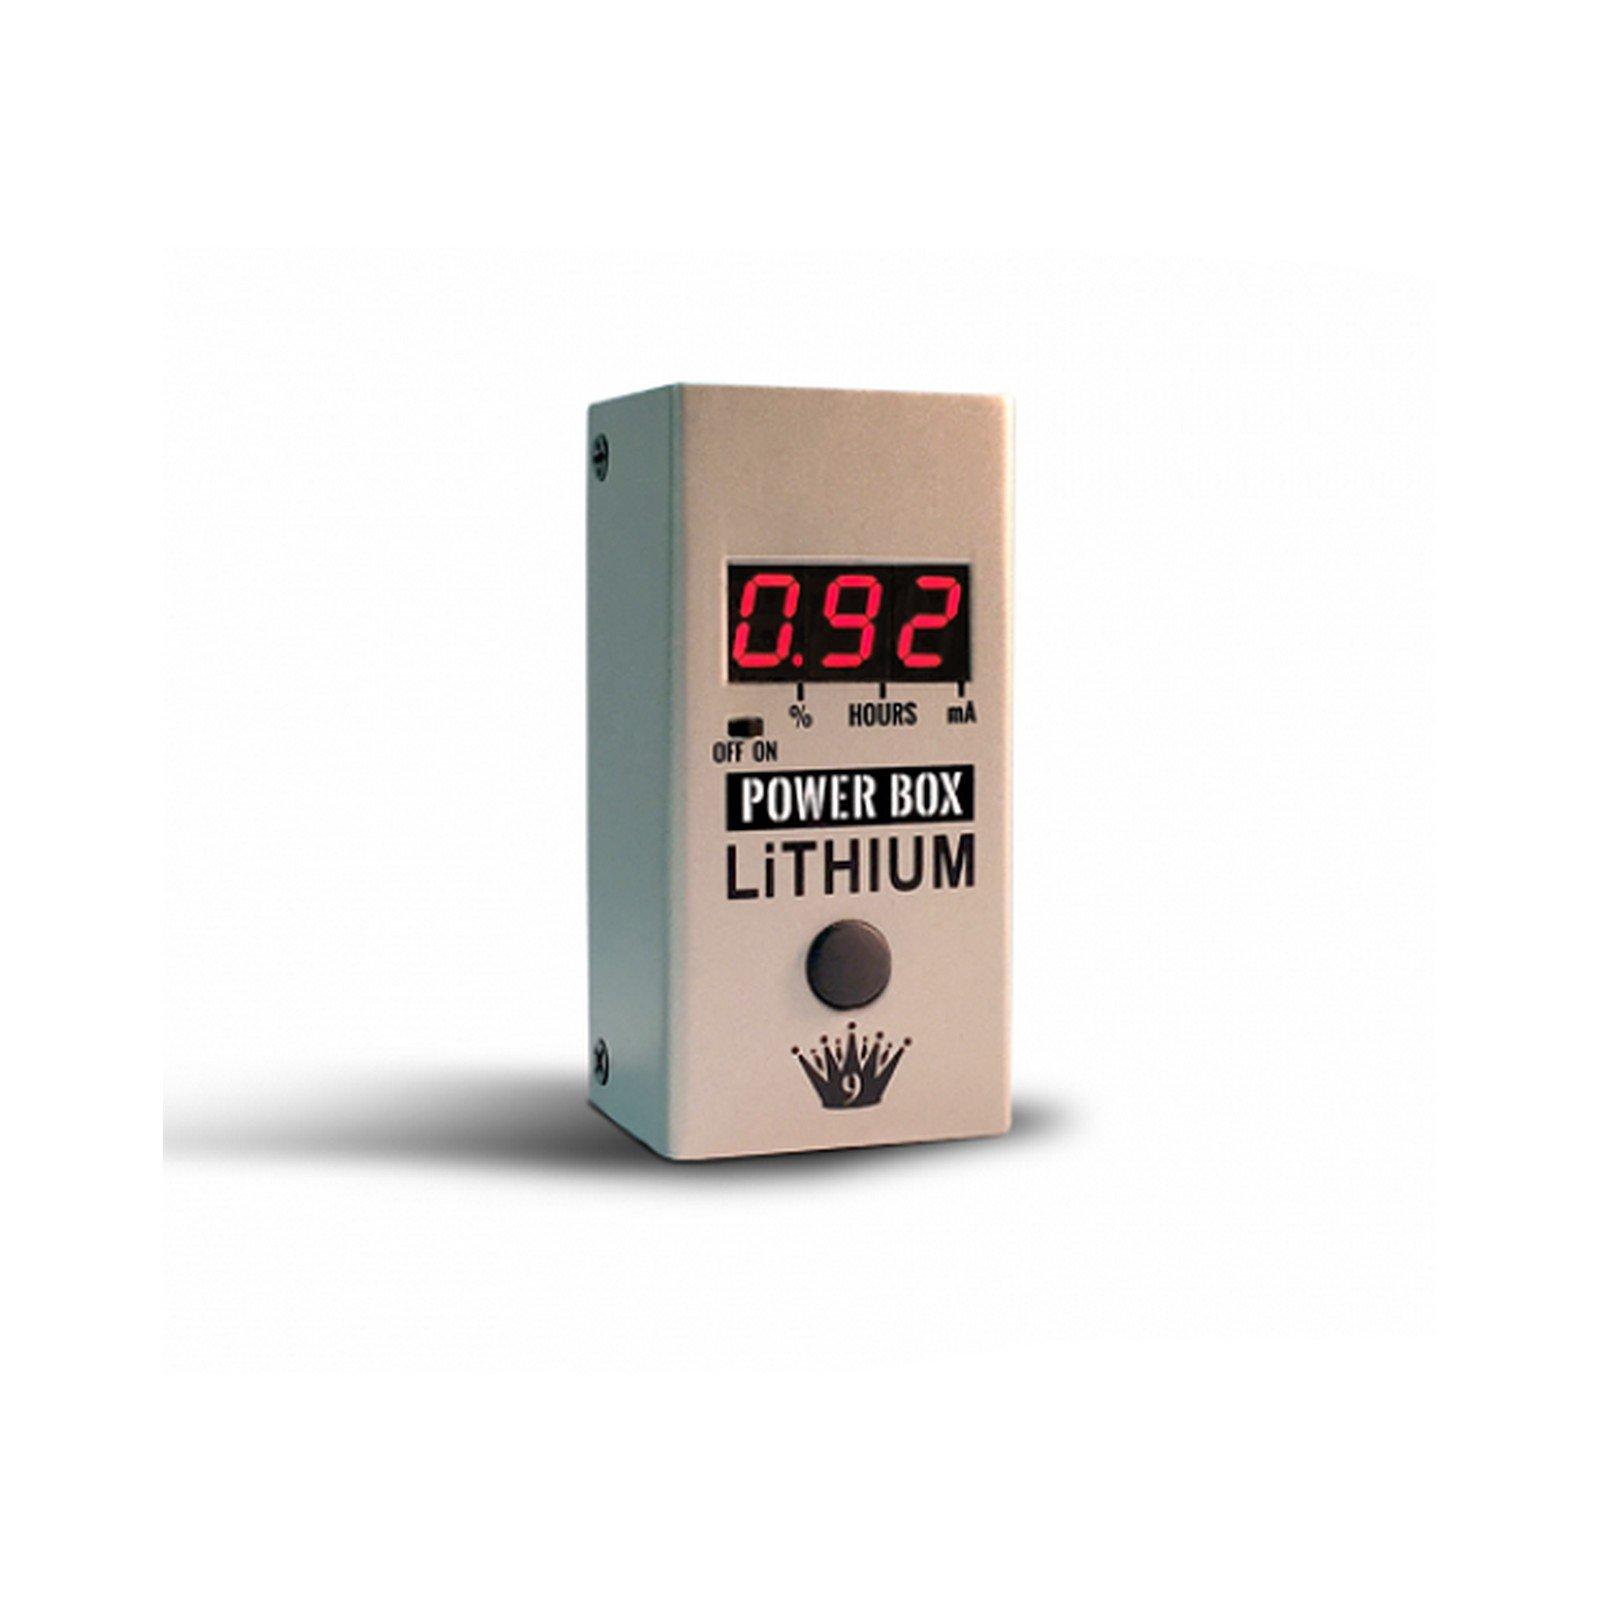 Big Joe Stomp Box Company PB-107 Power Box Lithium | 9v 500mA Rechargeable Lithium Battery Pedal Power Supply by Big Joe Stomp Box Company